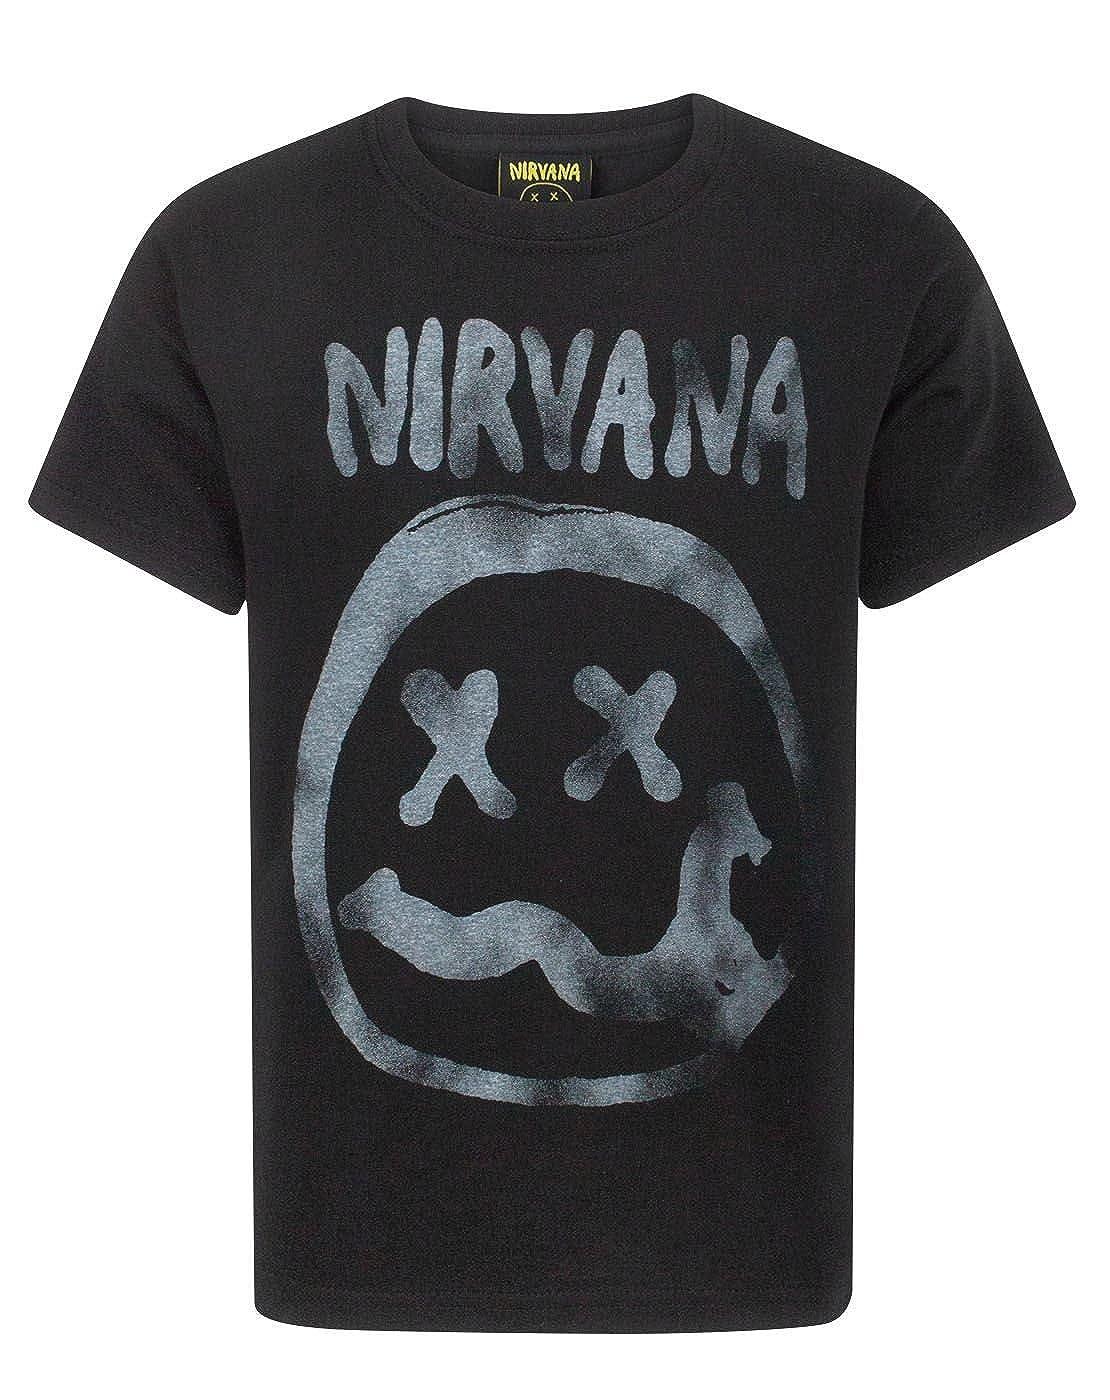 Nirvana Smiley Logo Boys T-Shirt